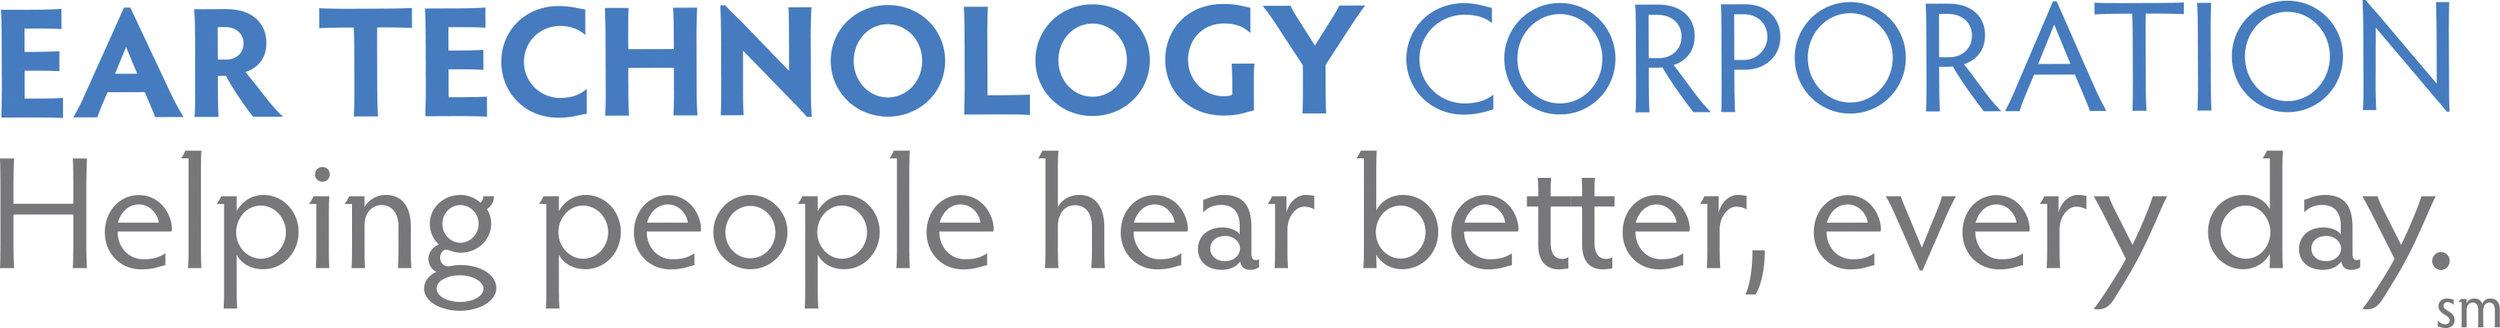 Ear Technology Corporation - 5-17-18.jpg